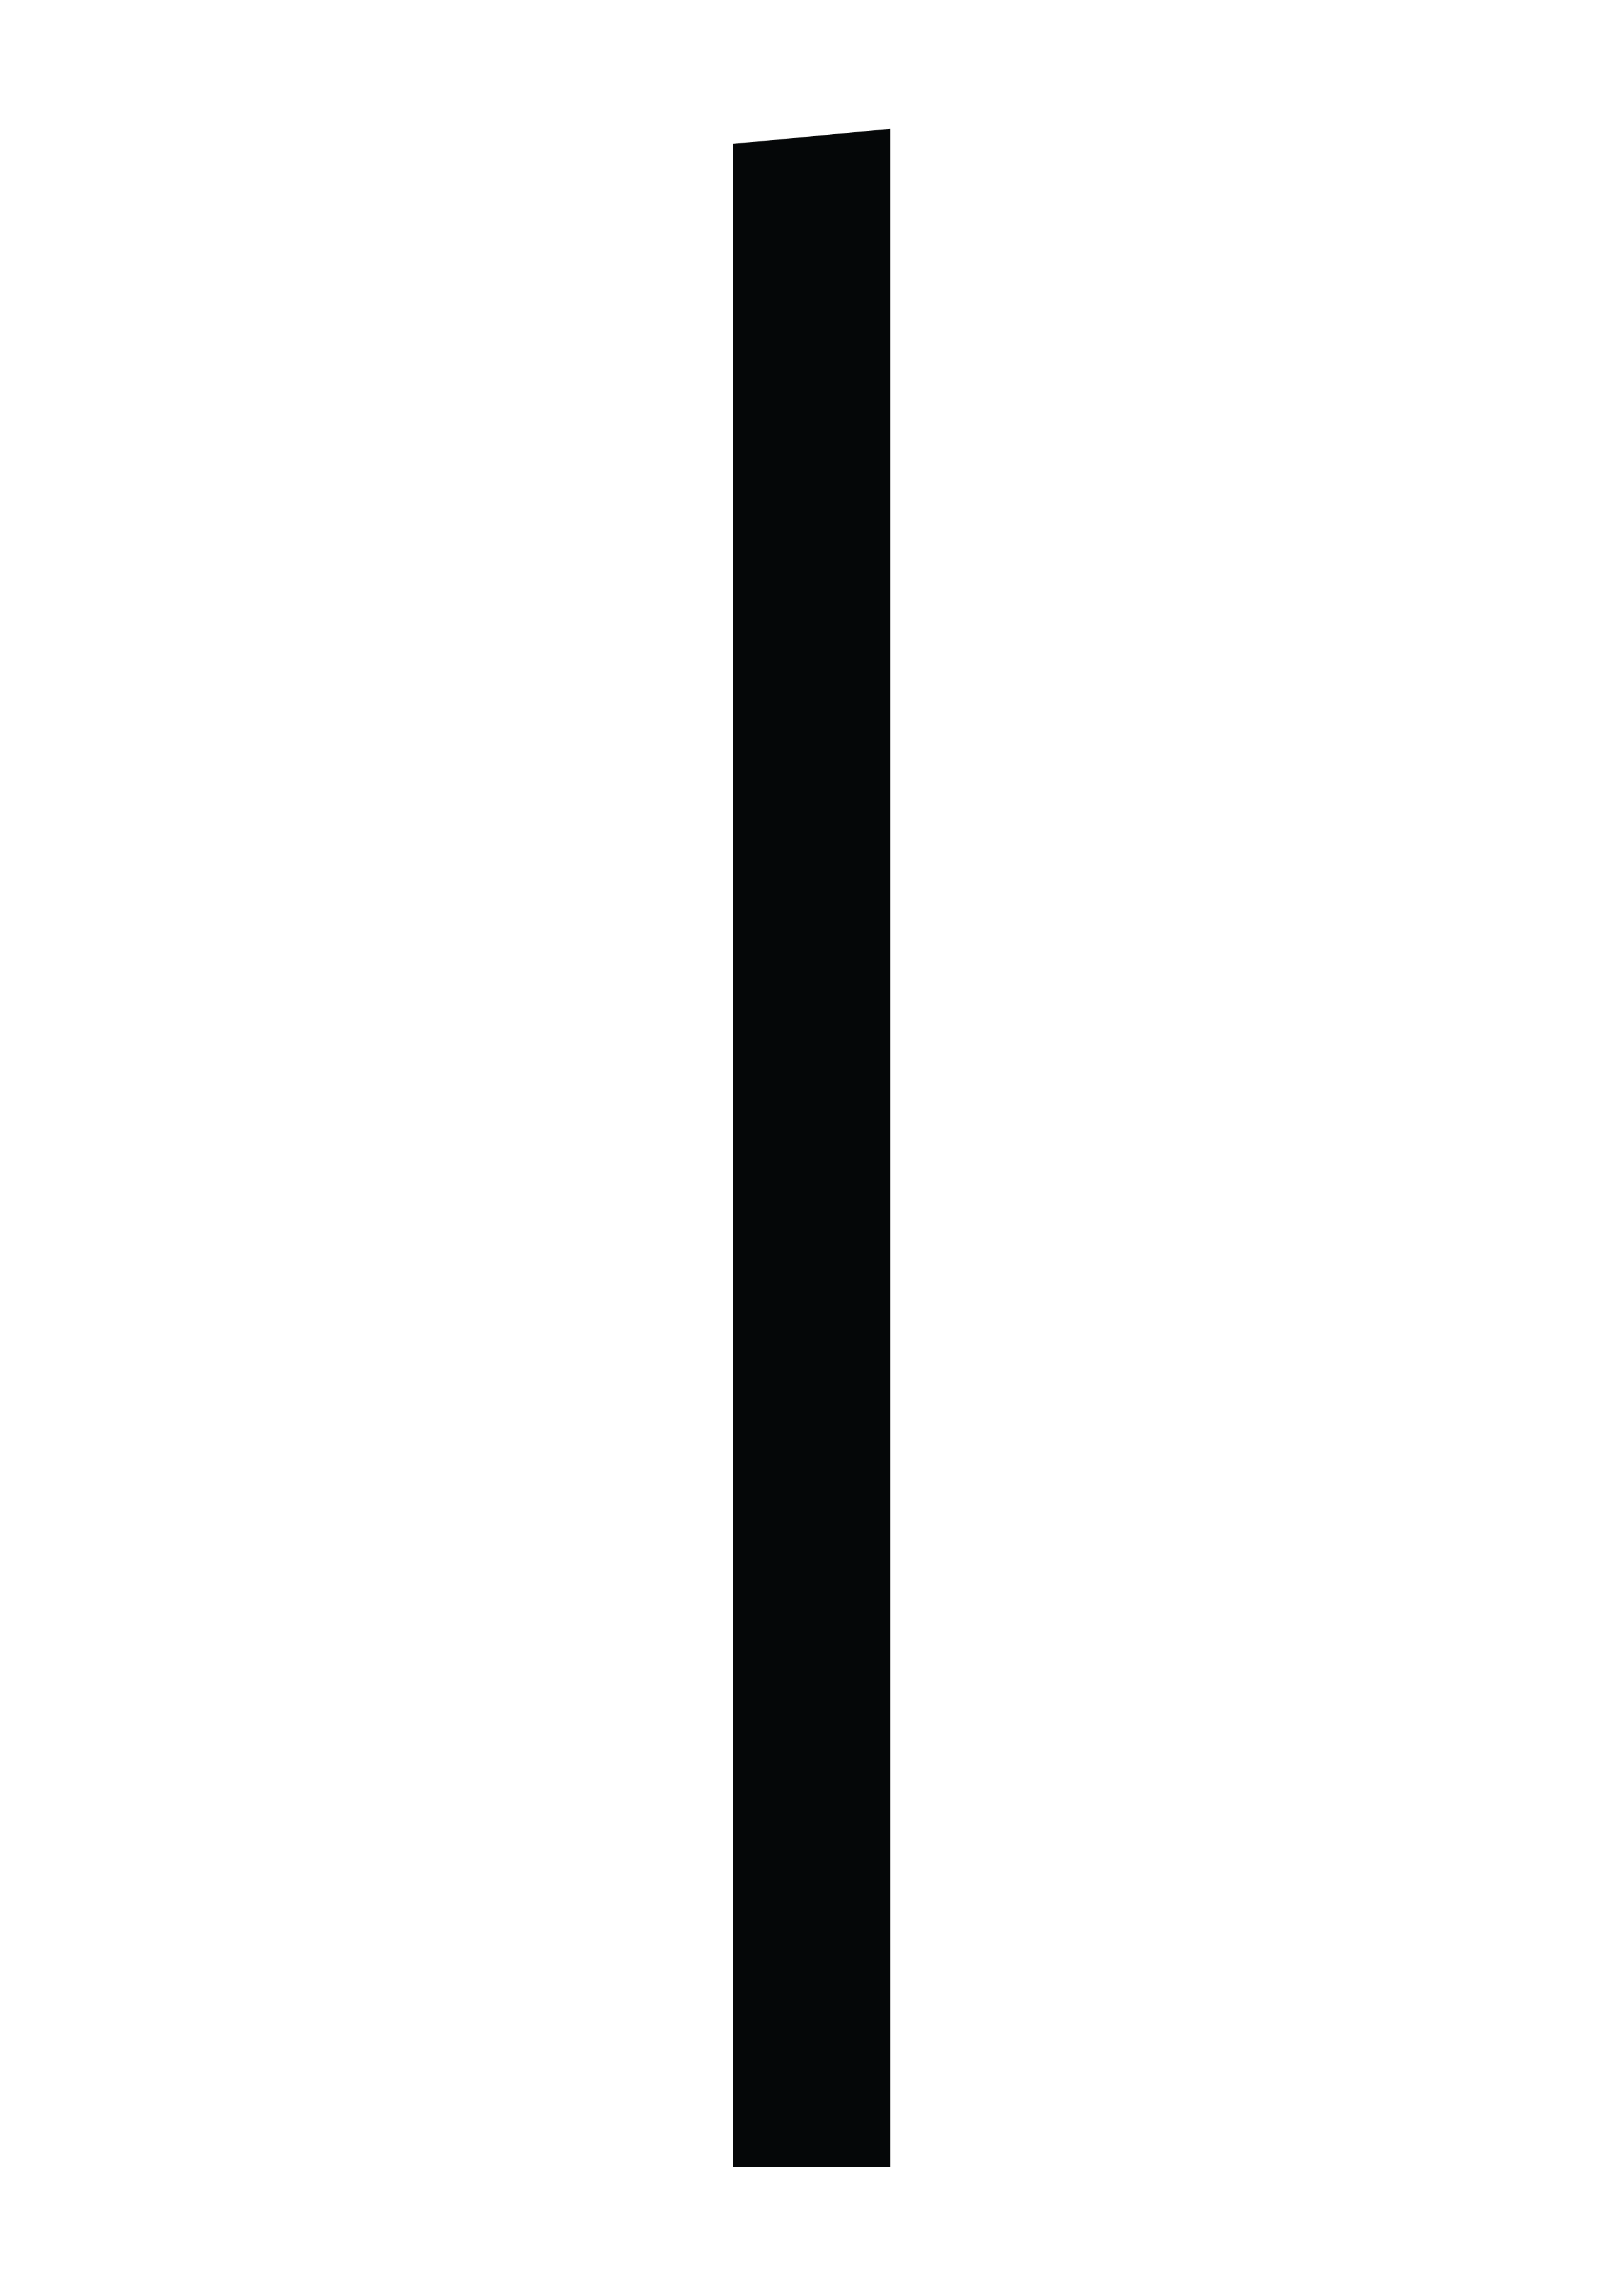 BINARY CODE-02.png